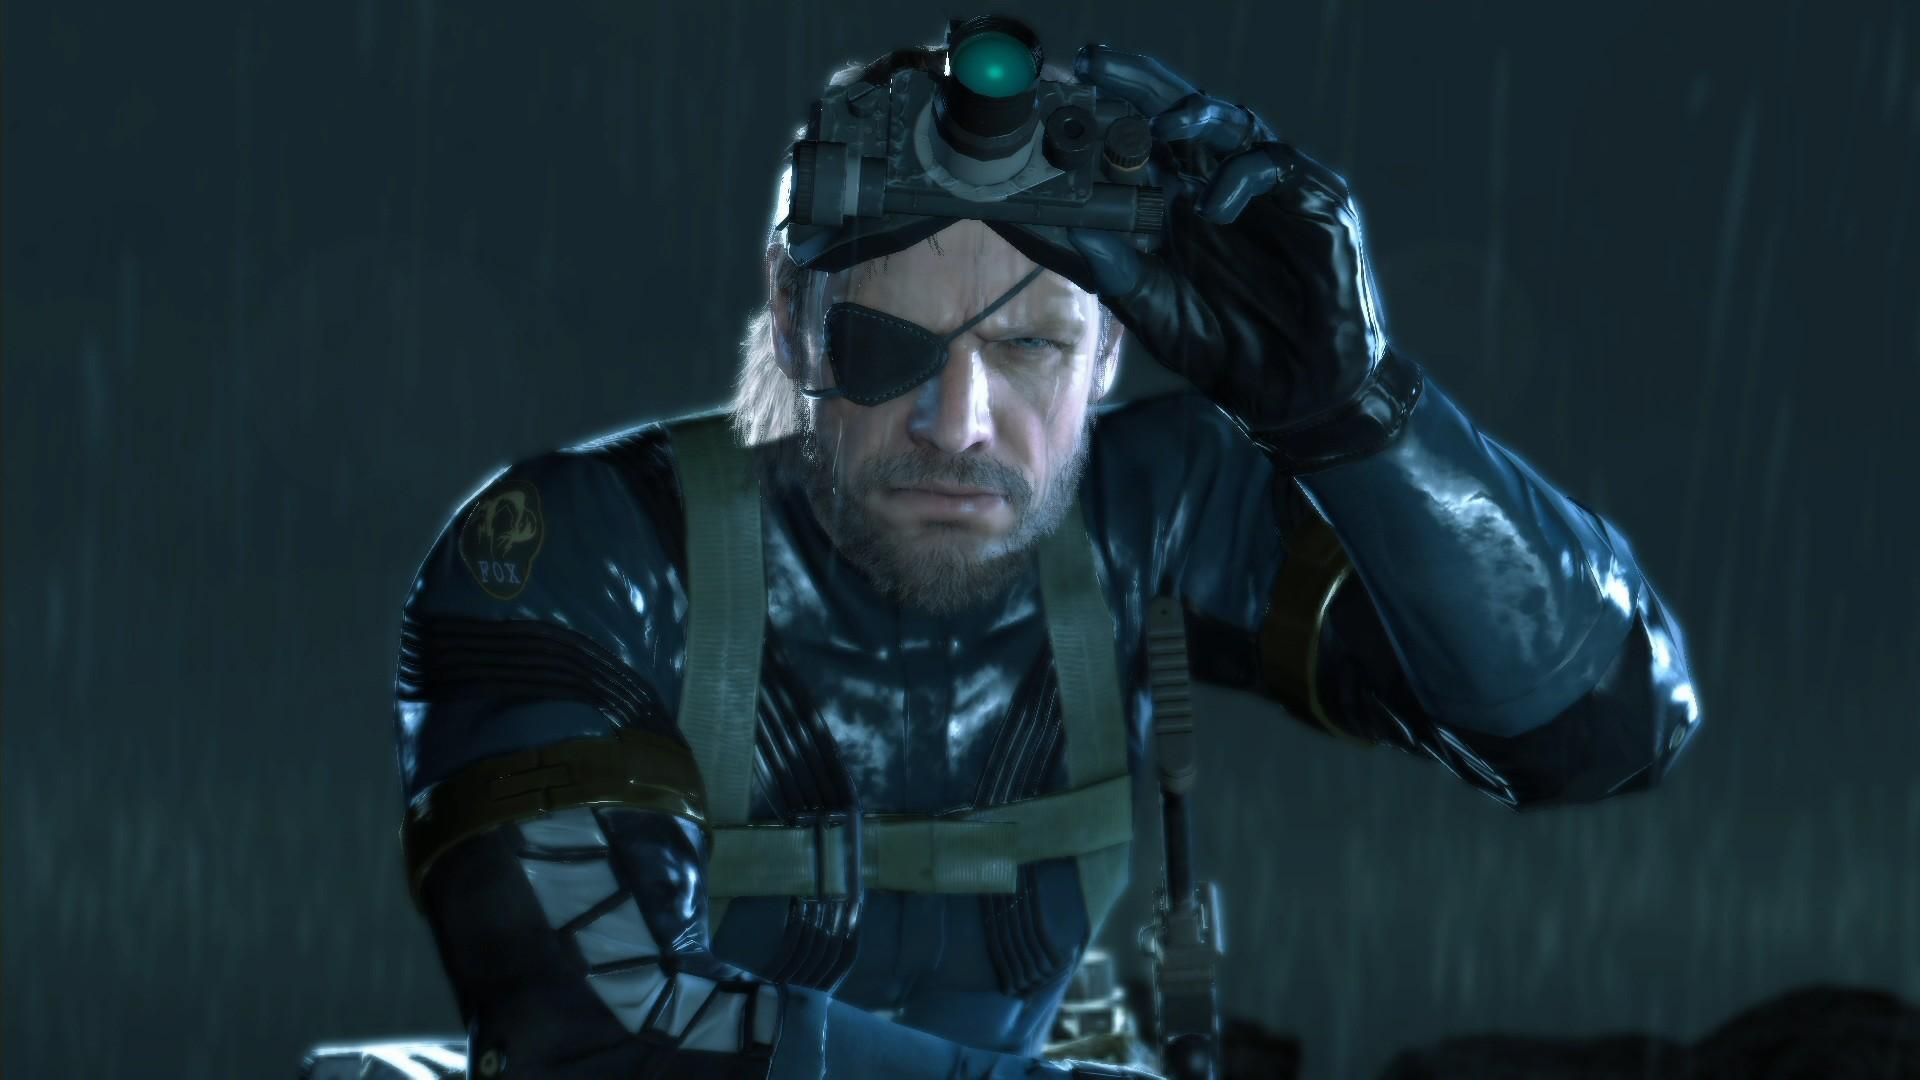 wallpaper : video games, metal gear solid, metal gear, metal gear